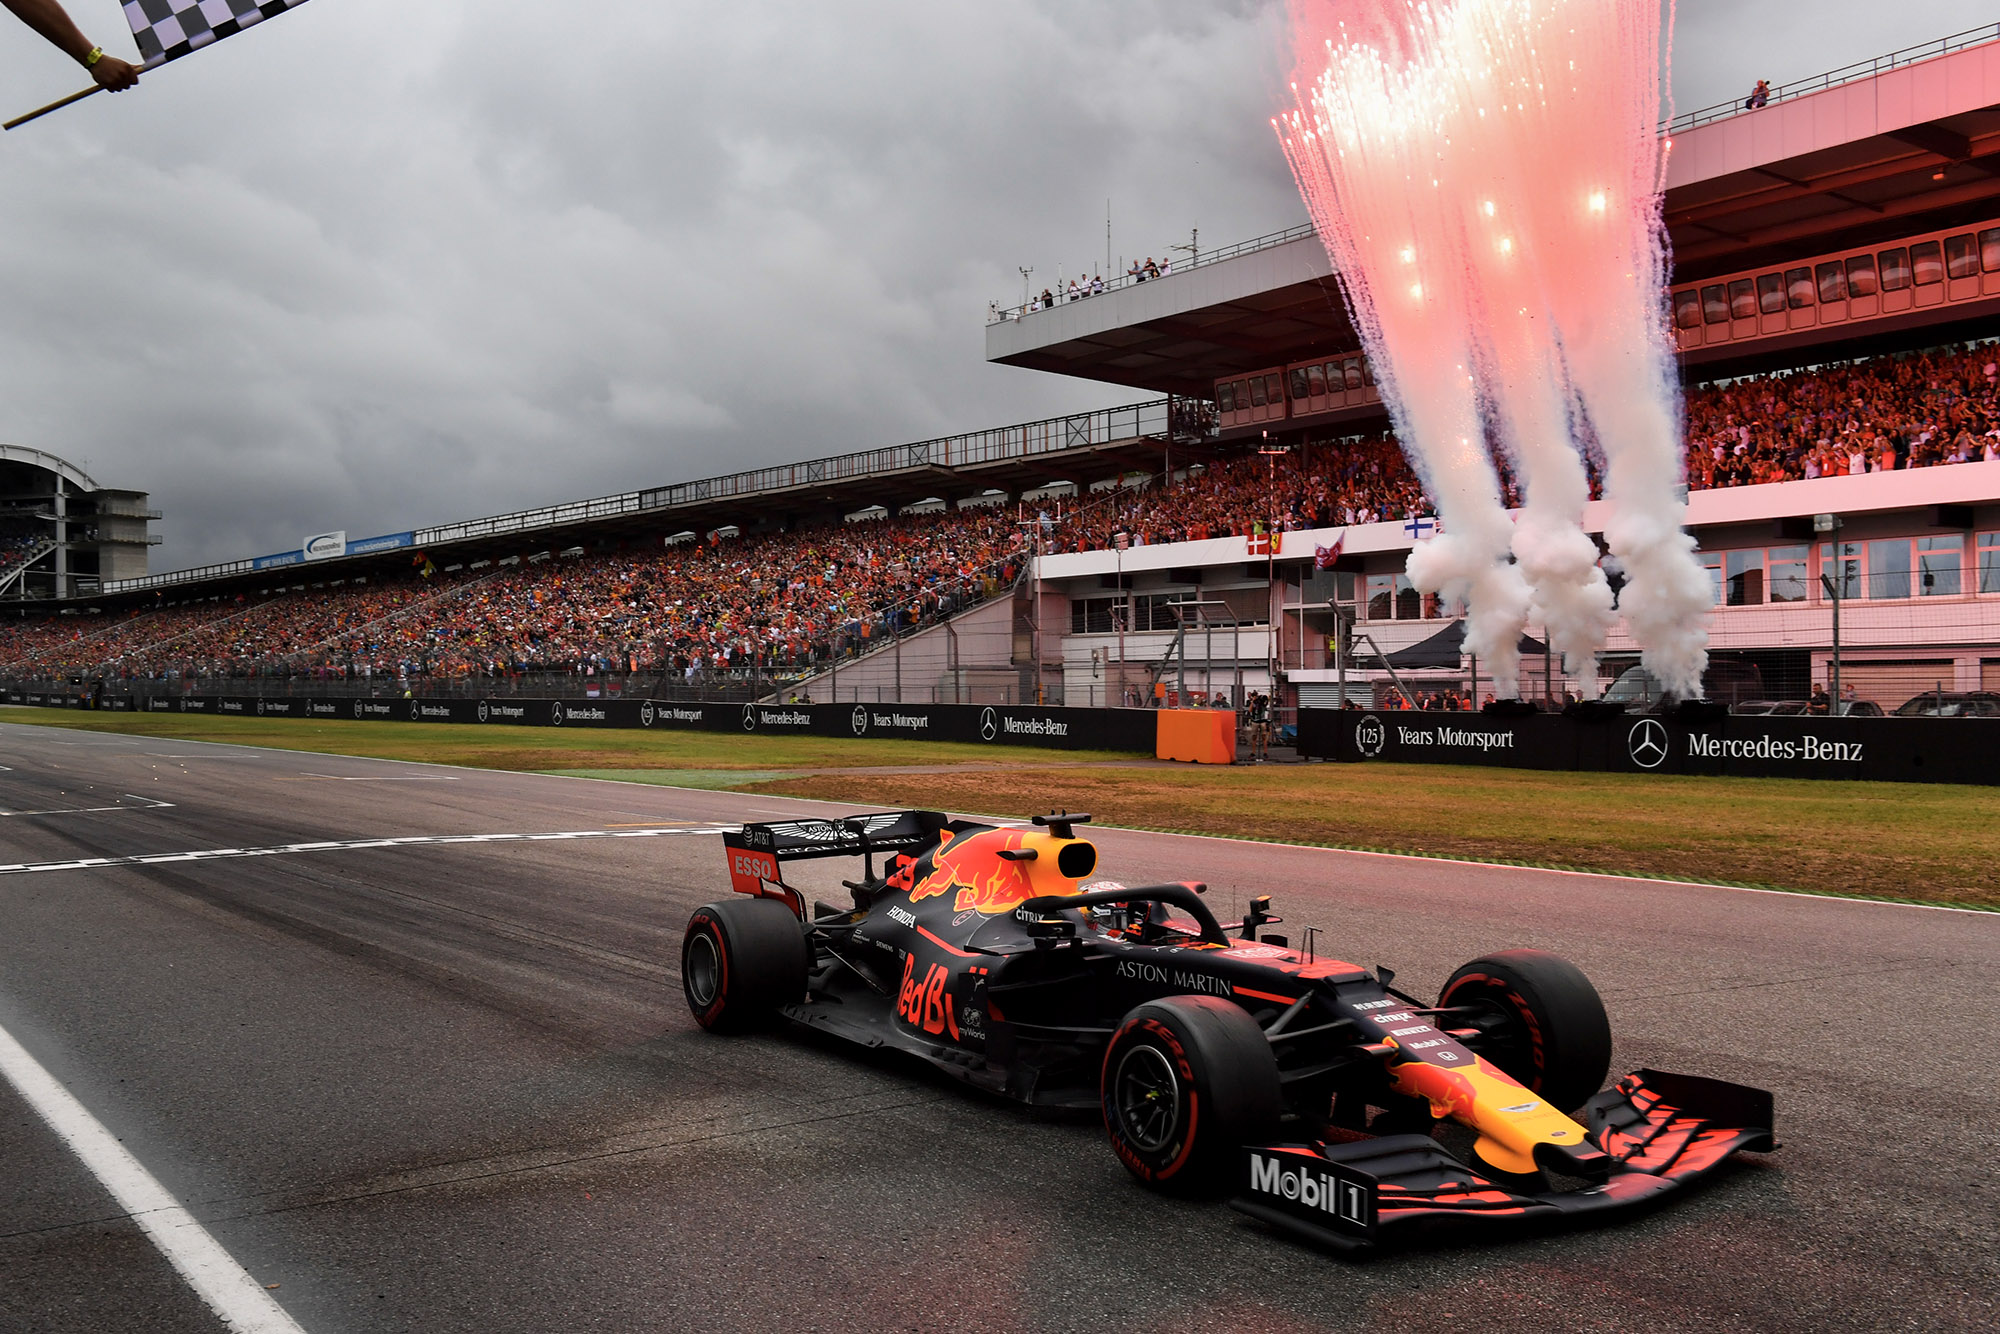 Max Verstappen wins the 2019 German Grand Prix at Hockenheim